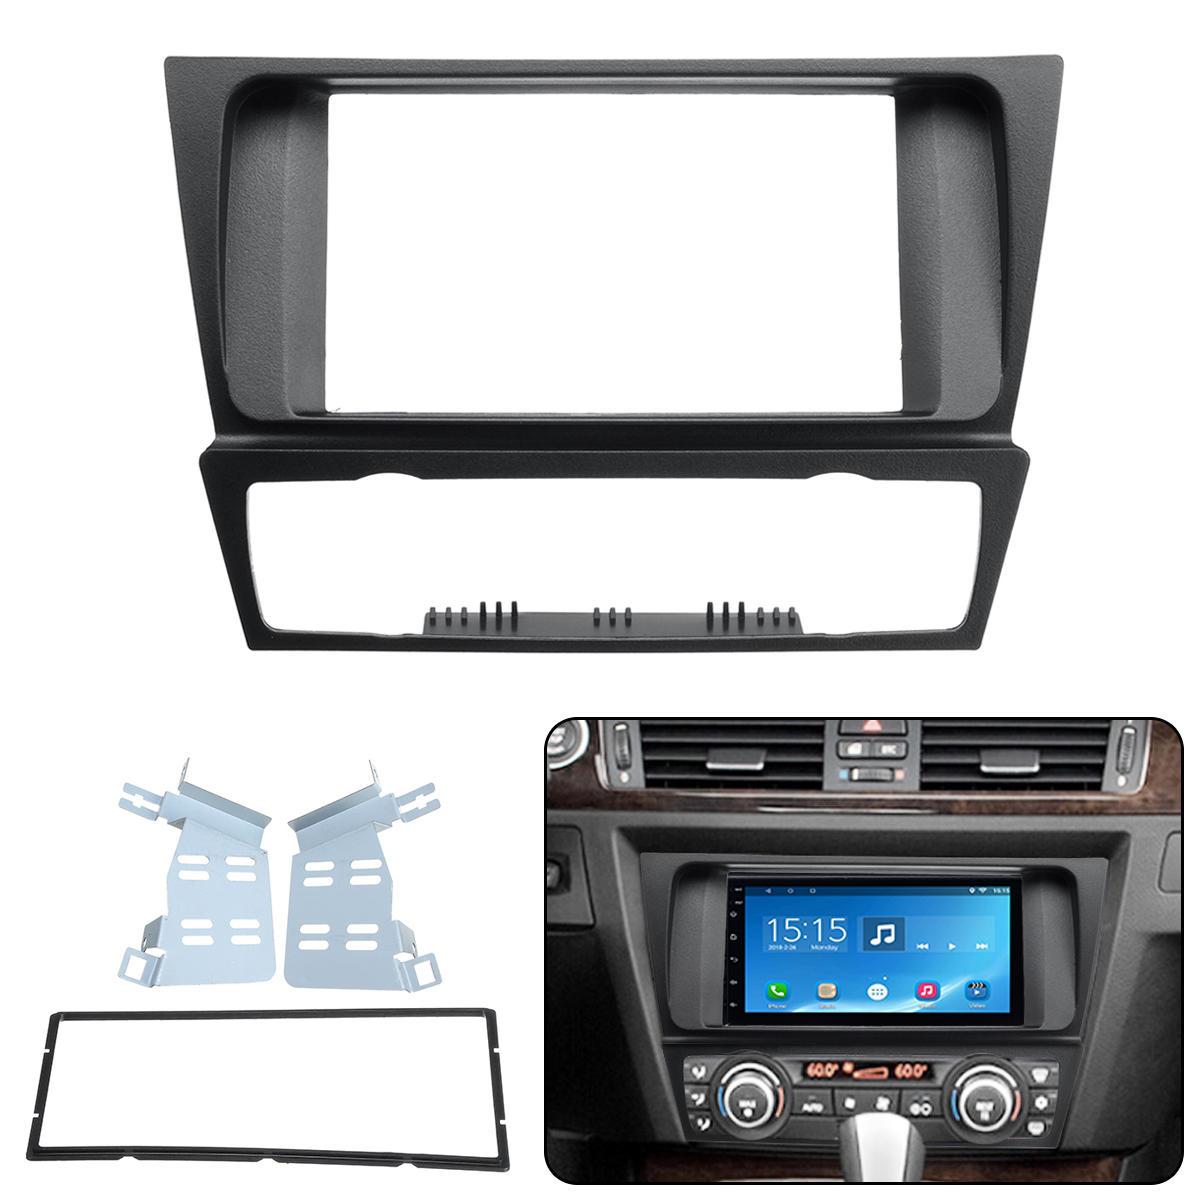 2Din Car Radio Stereo Surround Fascia Panel Plate Adapter For BMW 3 Series E90 E91 E92 E93 04-12